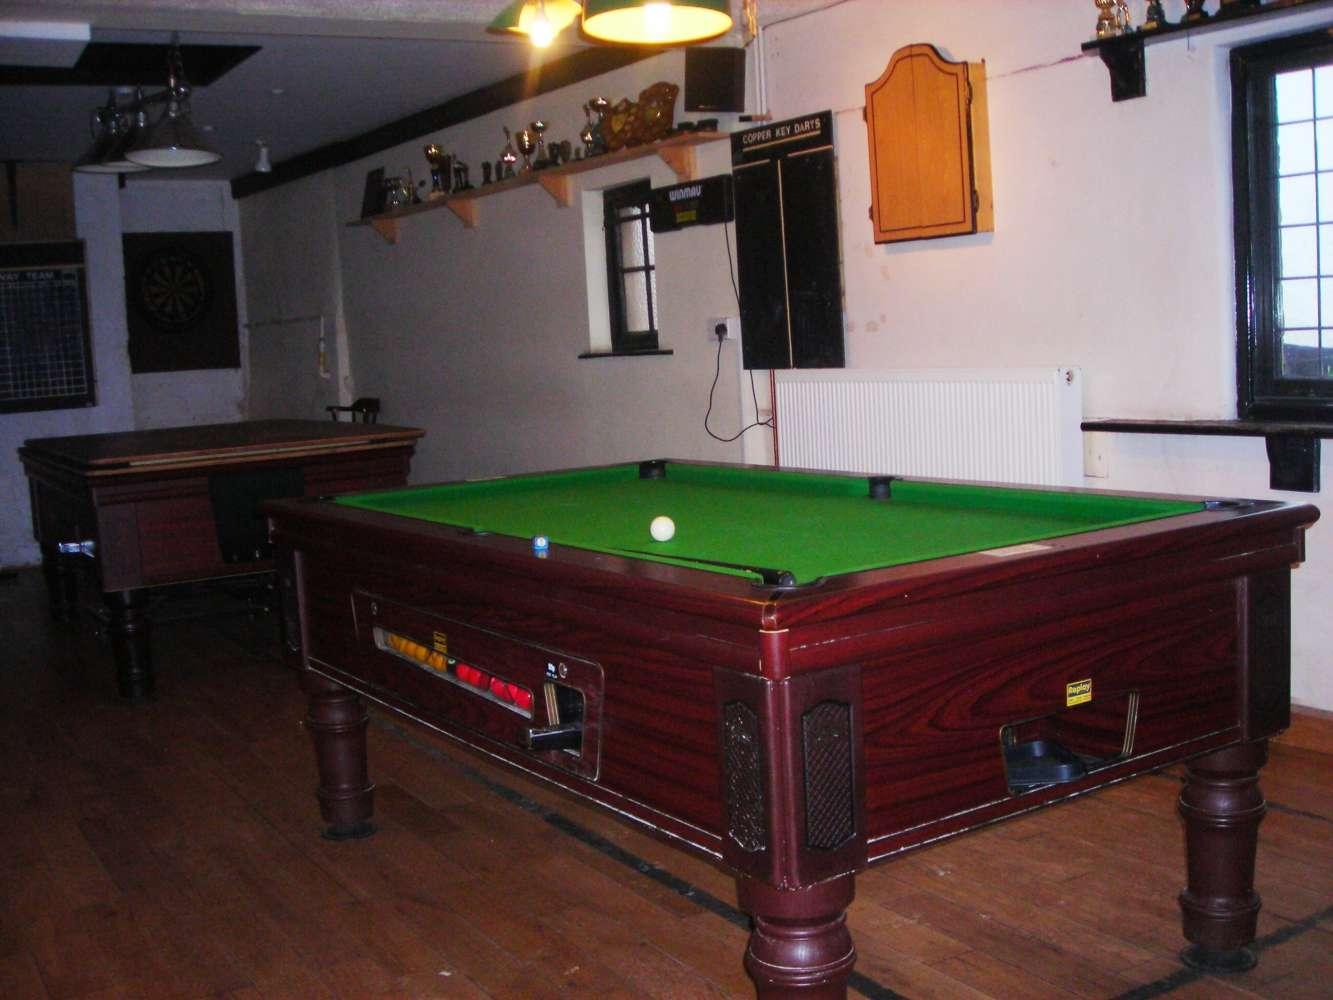 Pub North tawton, EX20 2ED - Copper Key Inn - 24870